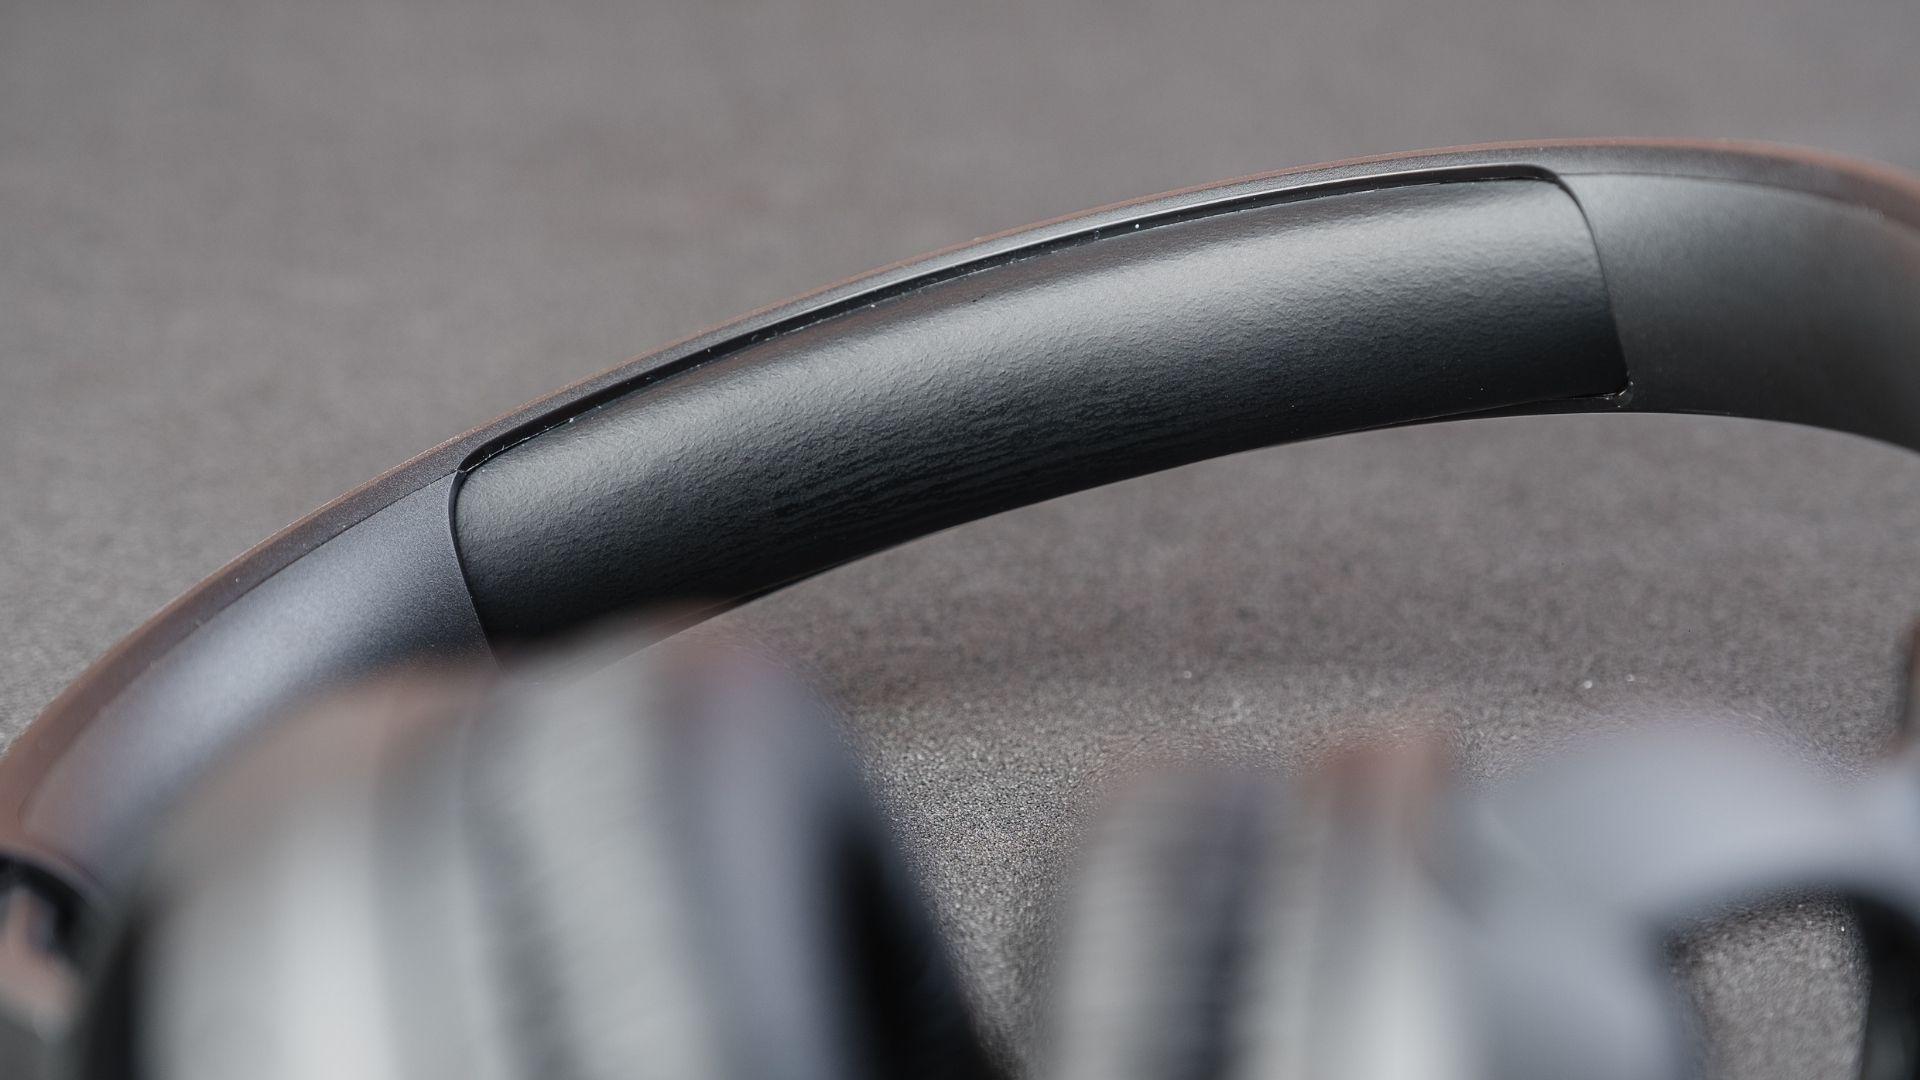 Detalhe do arco acolchoado do JBL Tune 500BT (Foto: Zoom)